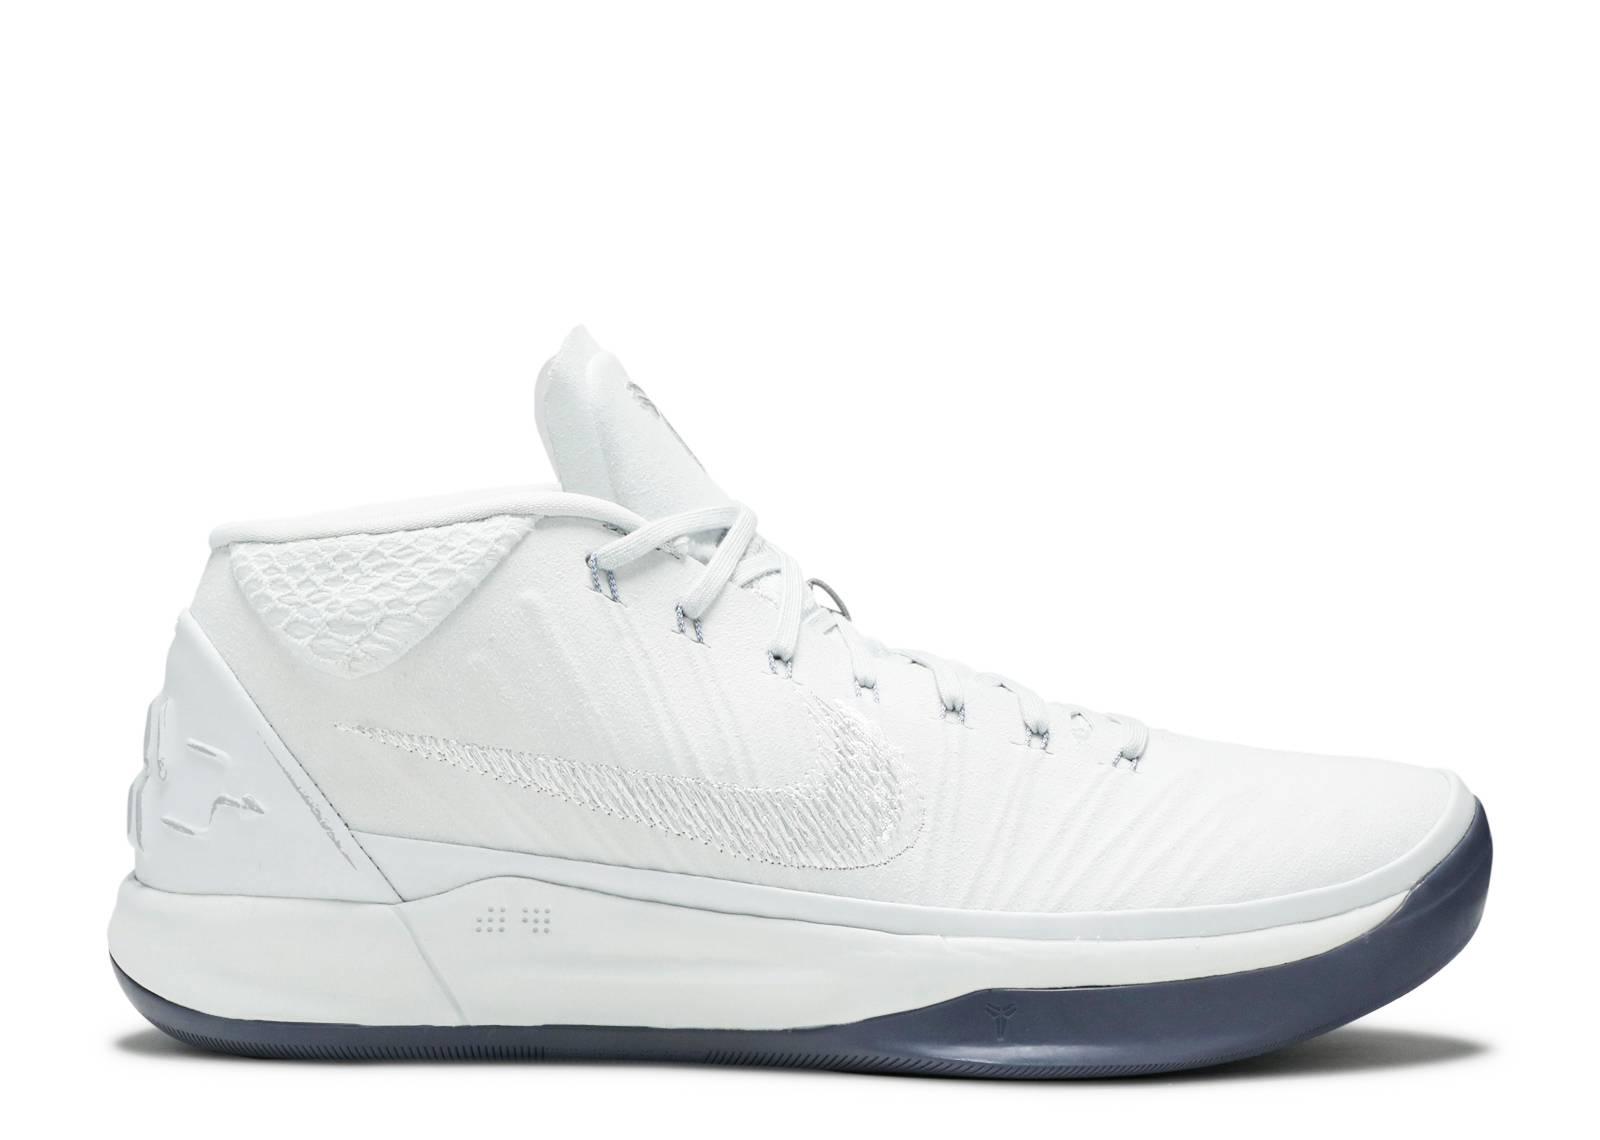 f2504c19d3b8 Kobe Ad - Nike - 922482 004 - pure platinum white